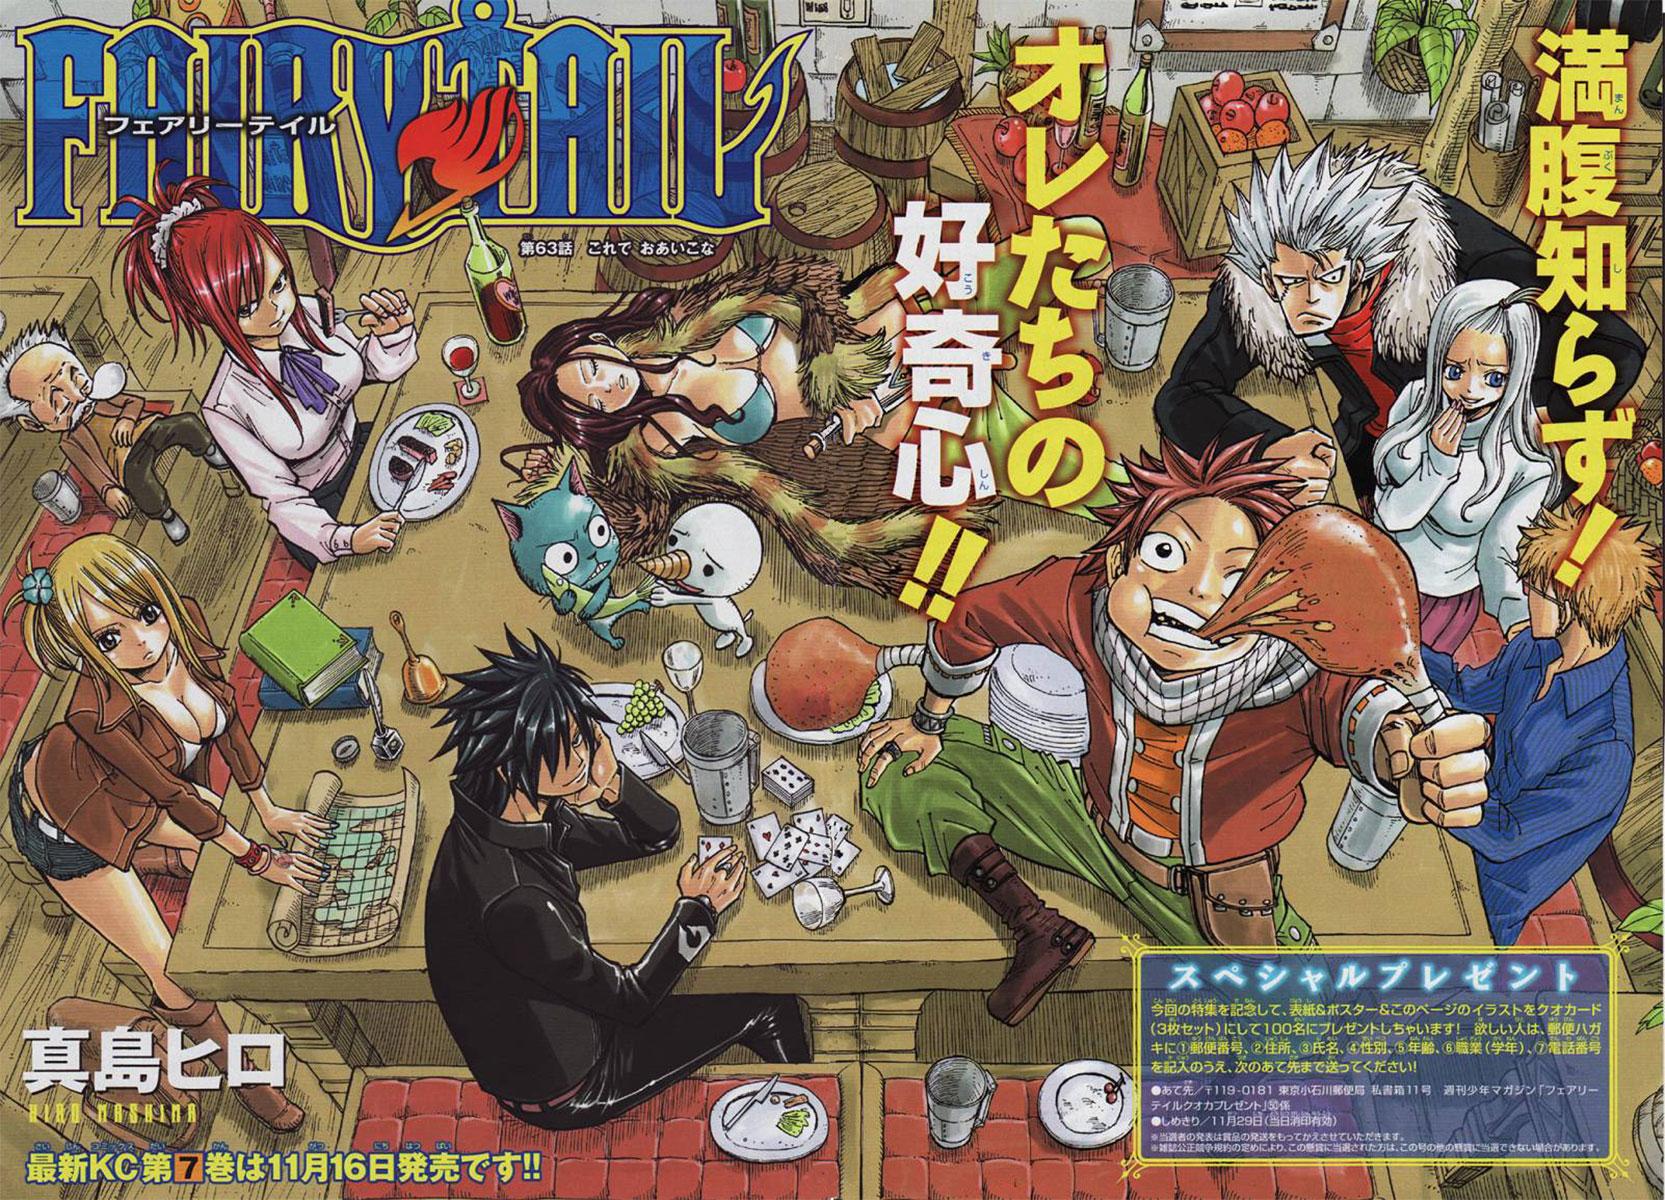 http://www.elbakin.net/plume/xmedia/fantasy/news/mangas/color-o5-o6.jpg